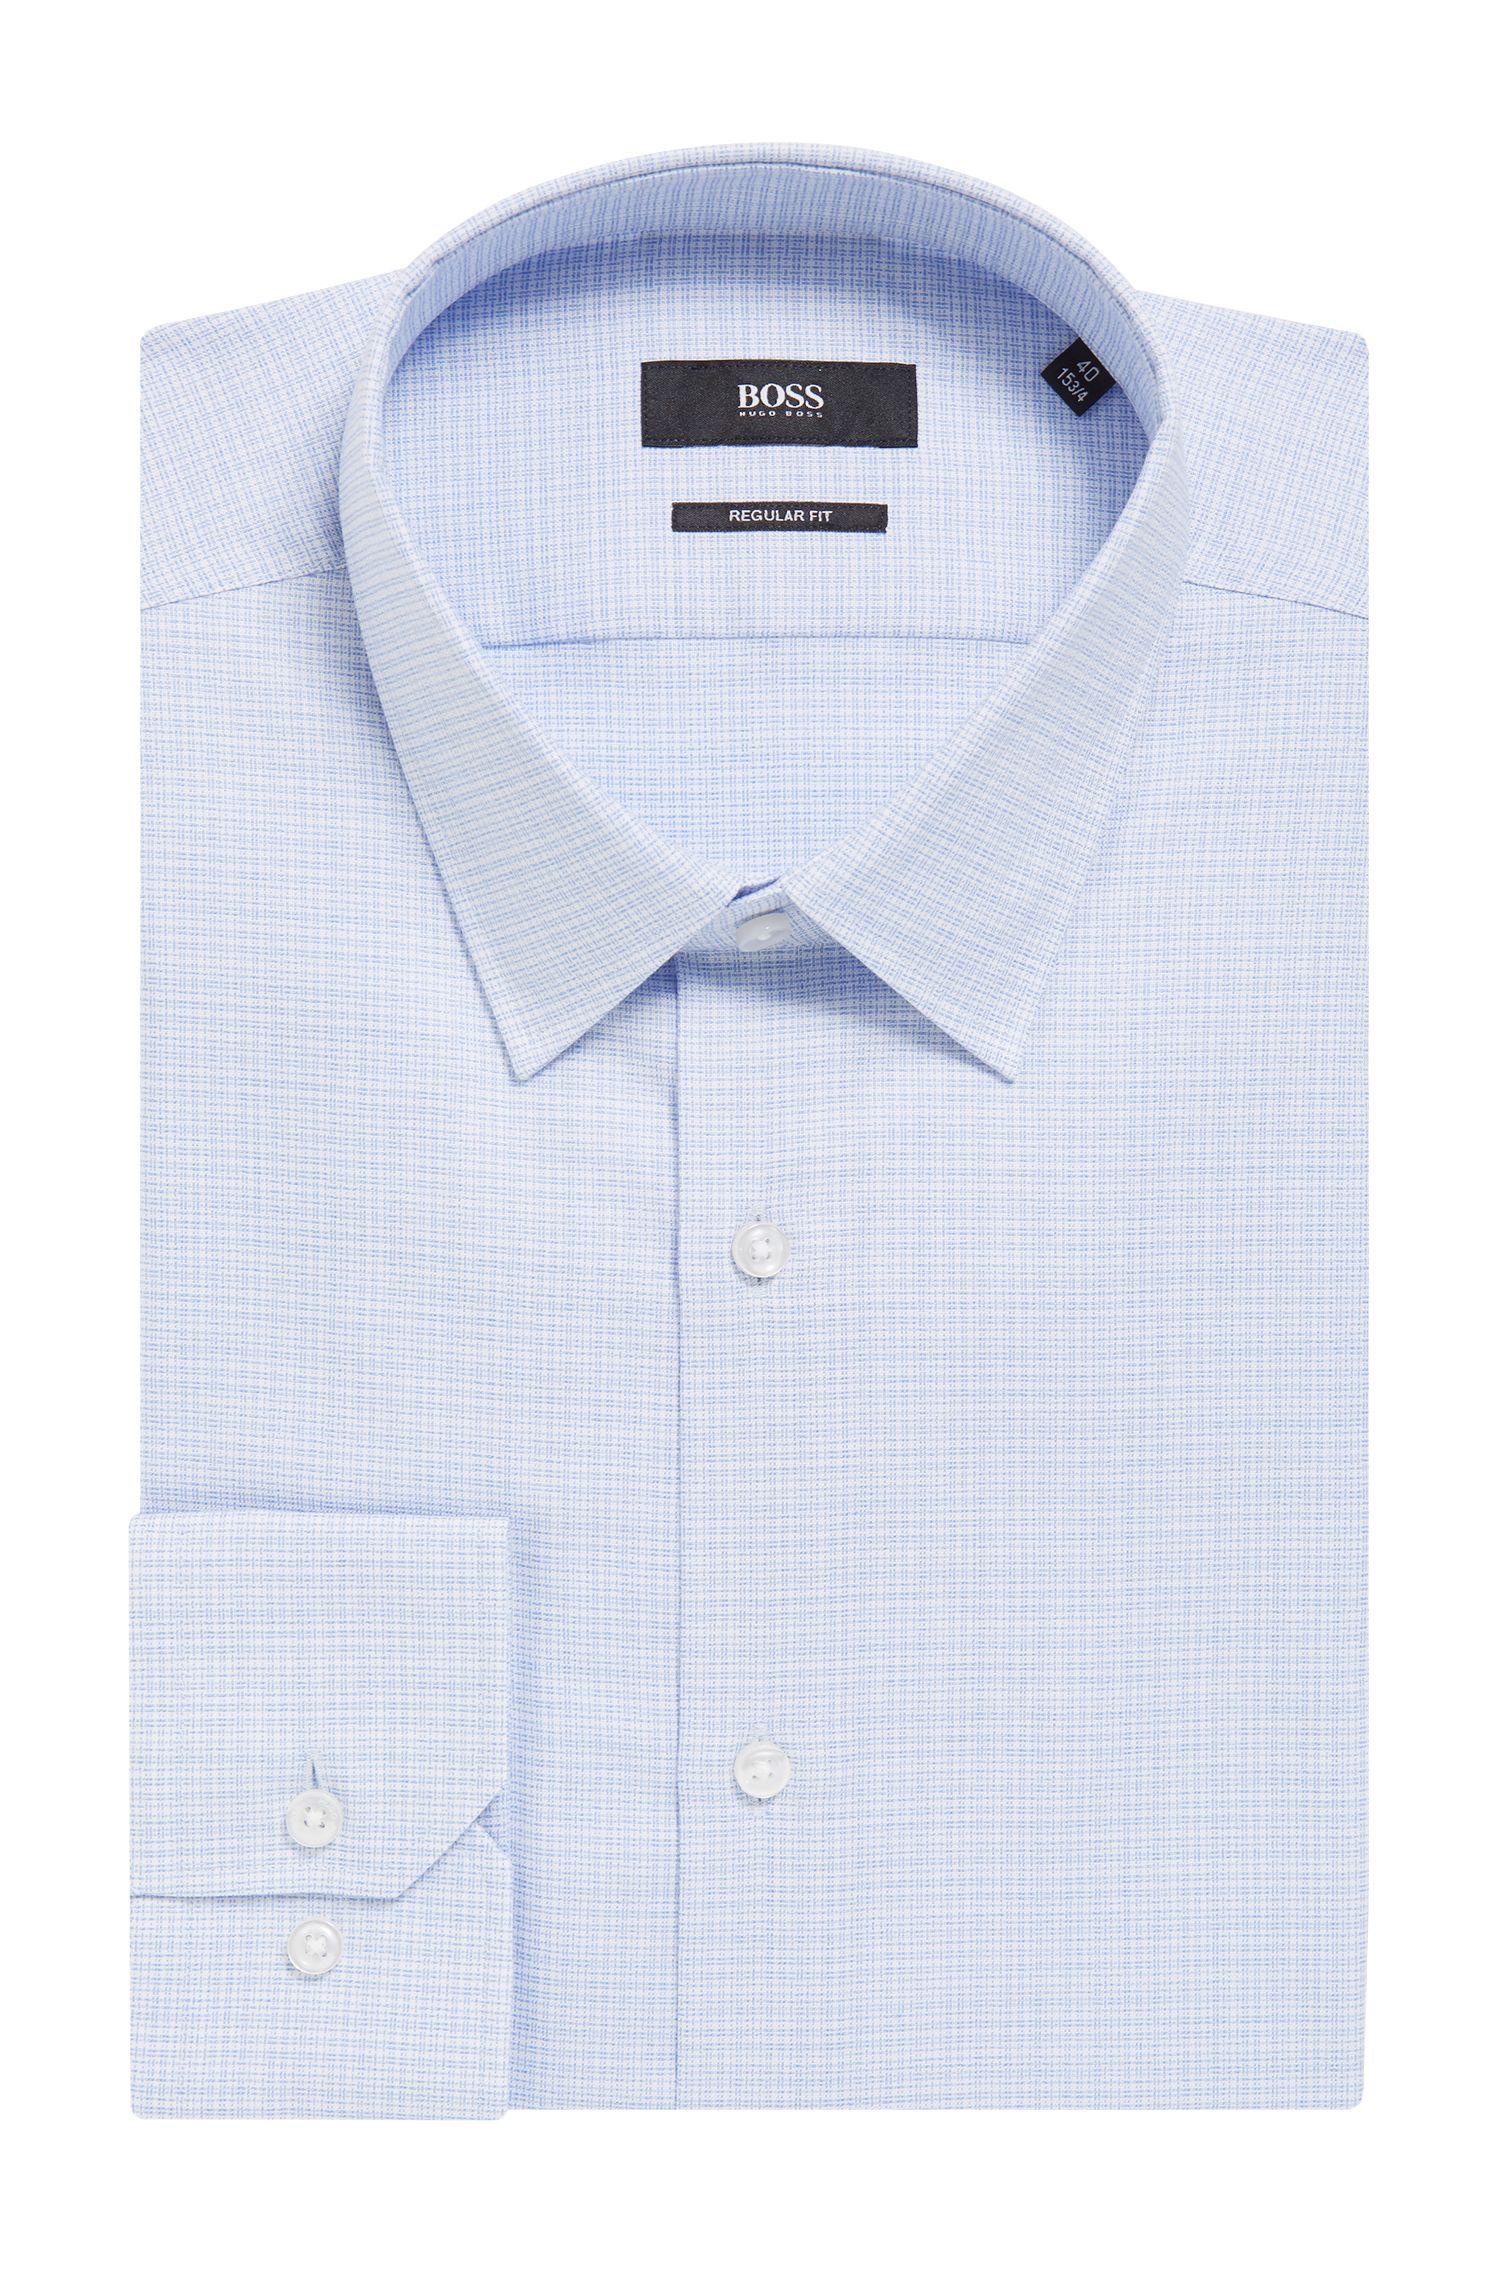 'Enzo' | Regular Fit, Crosshatch Easy Iron Cotton Dress Shirt